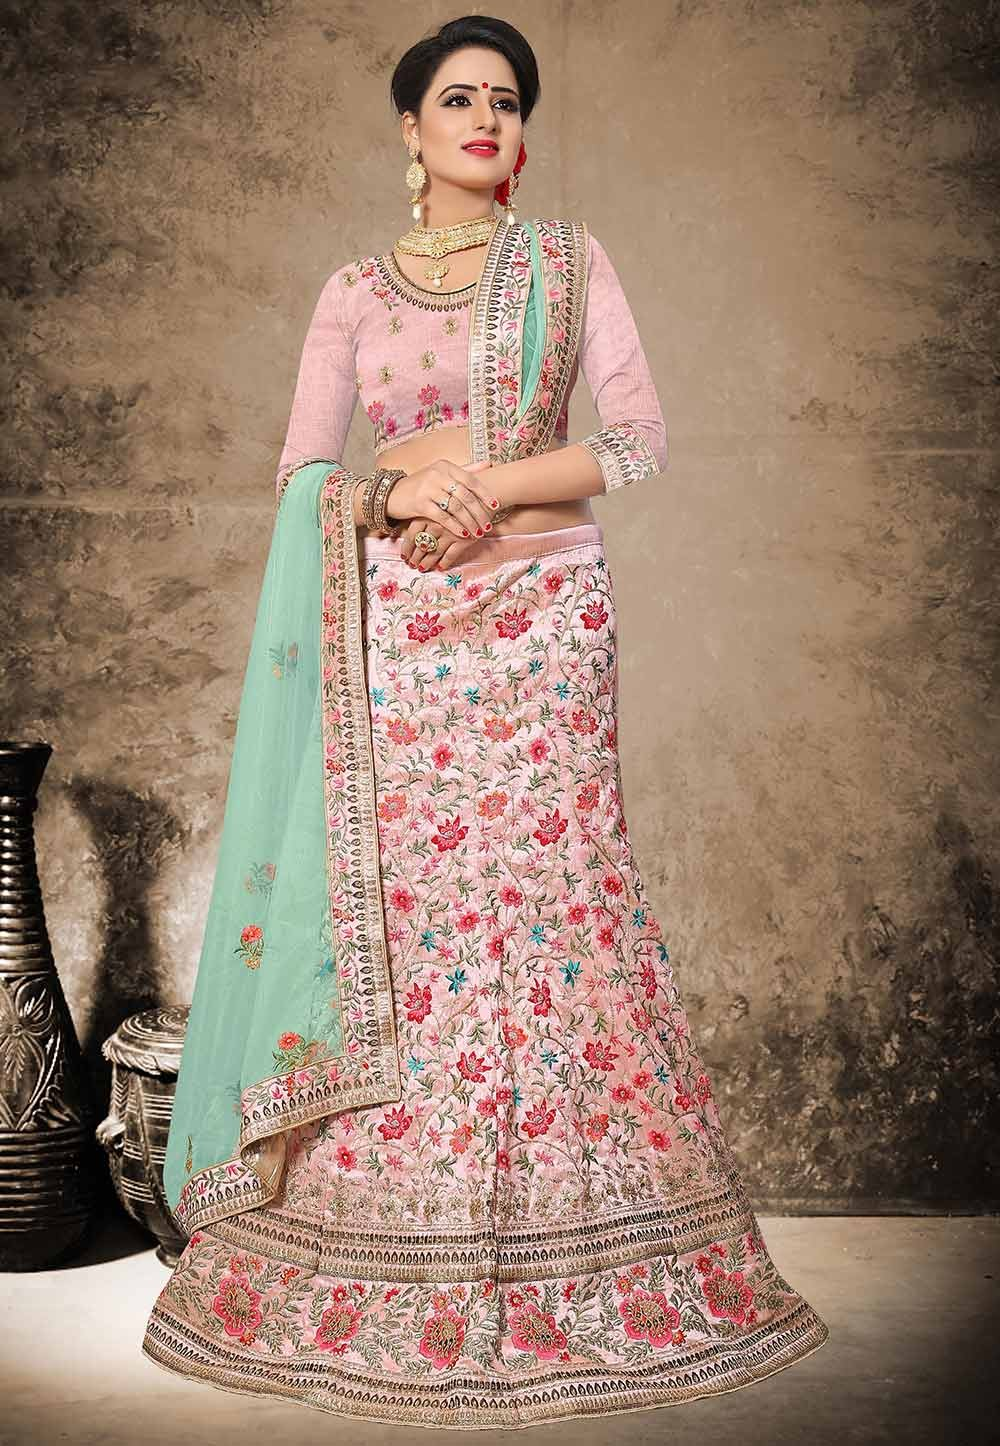 Beautiful Pink Color Silk Fabric Designer Lehenga Choli in Resham,Zari,Stone,Moti Work